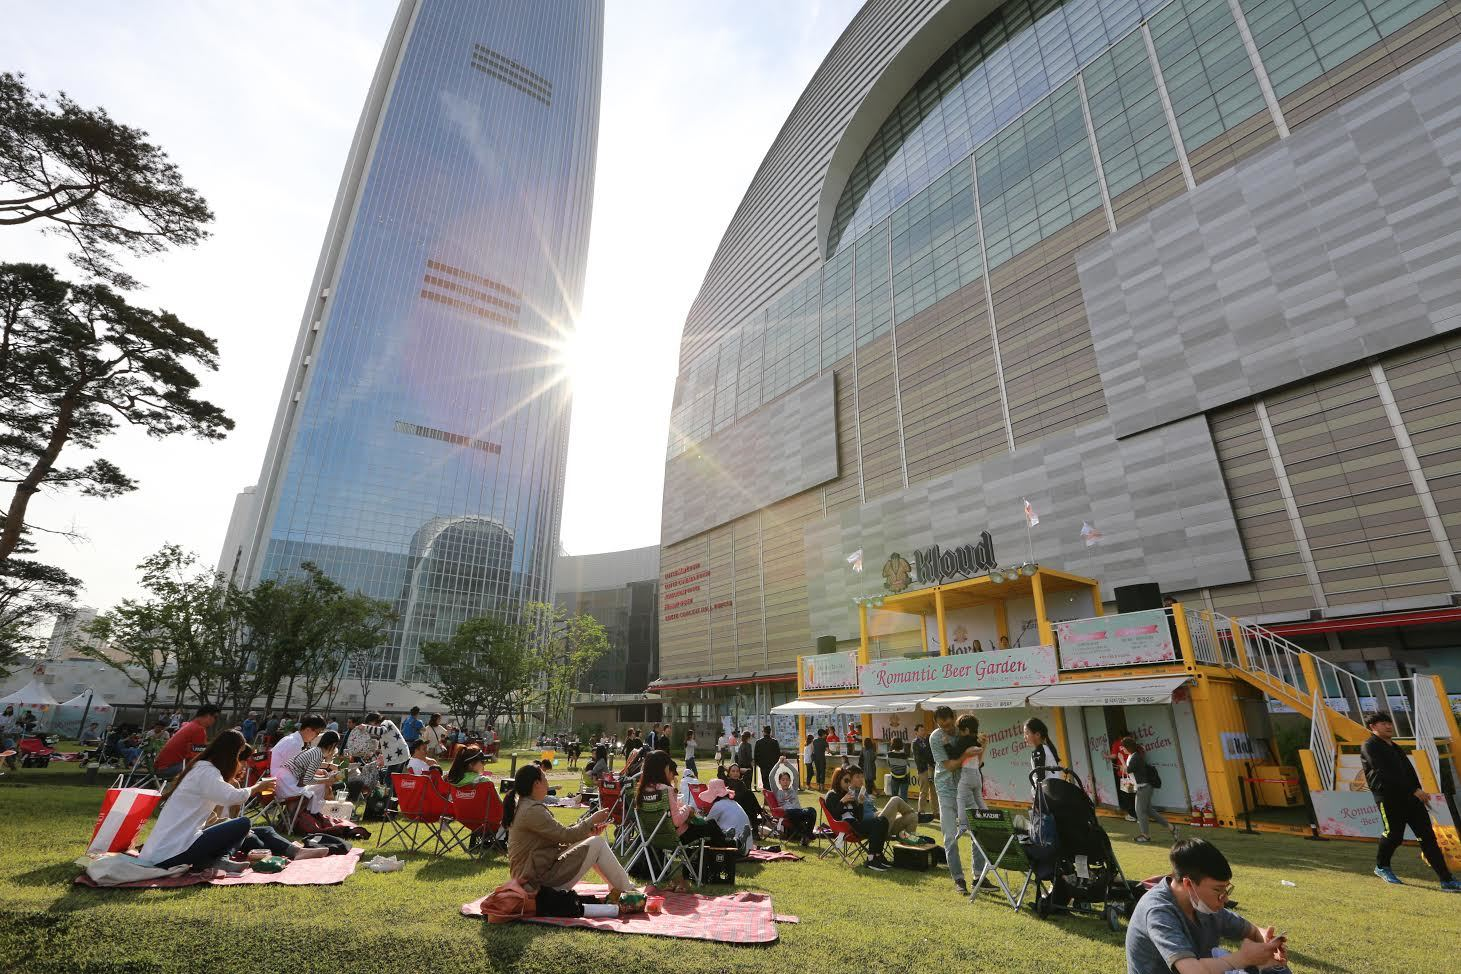 Already a landmark, Lotte World Mall